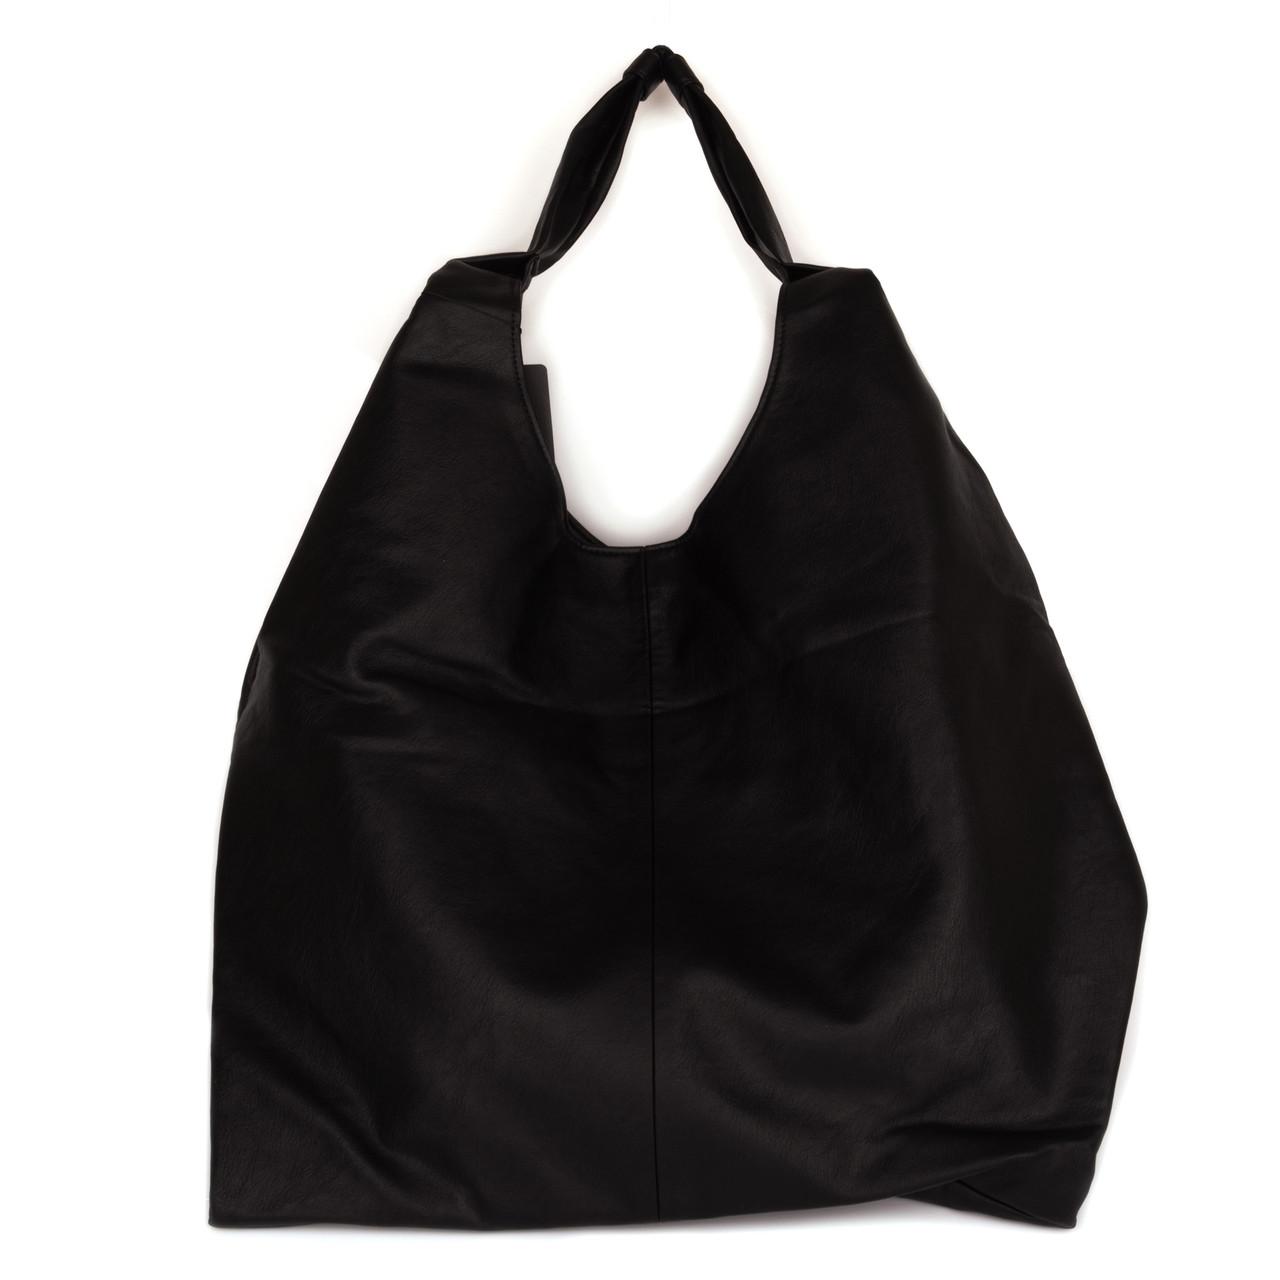 Женская Сумка Черная SHOPPER (9068)